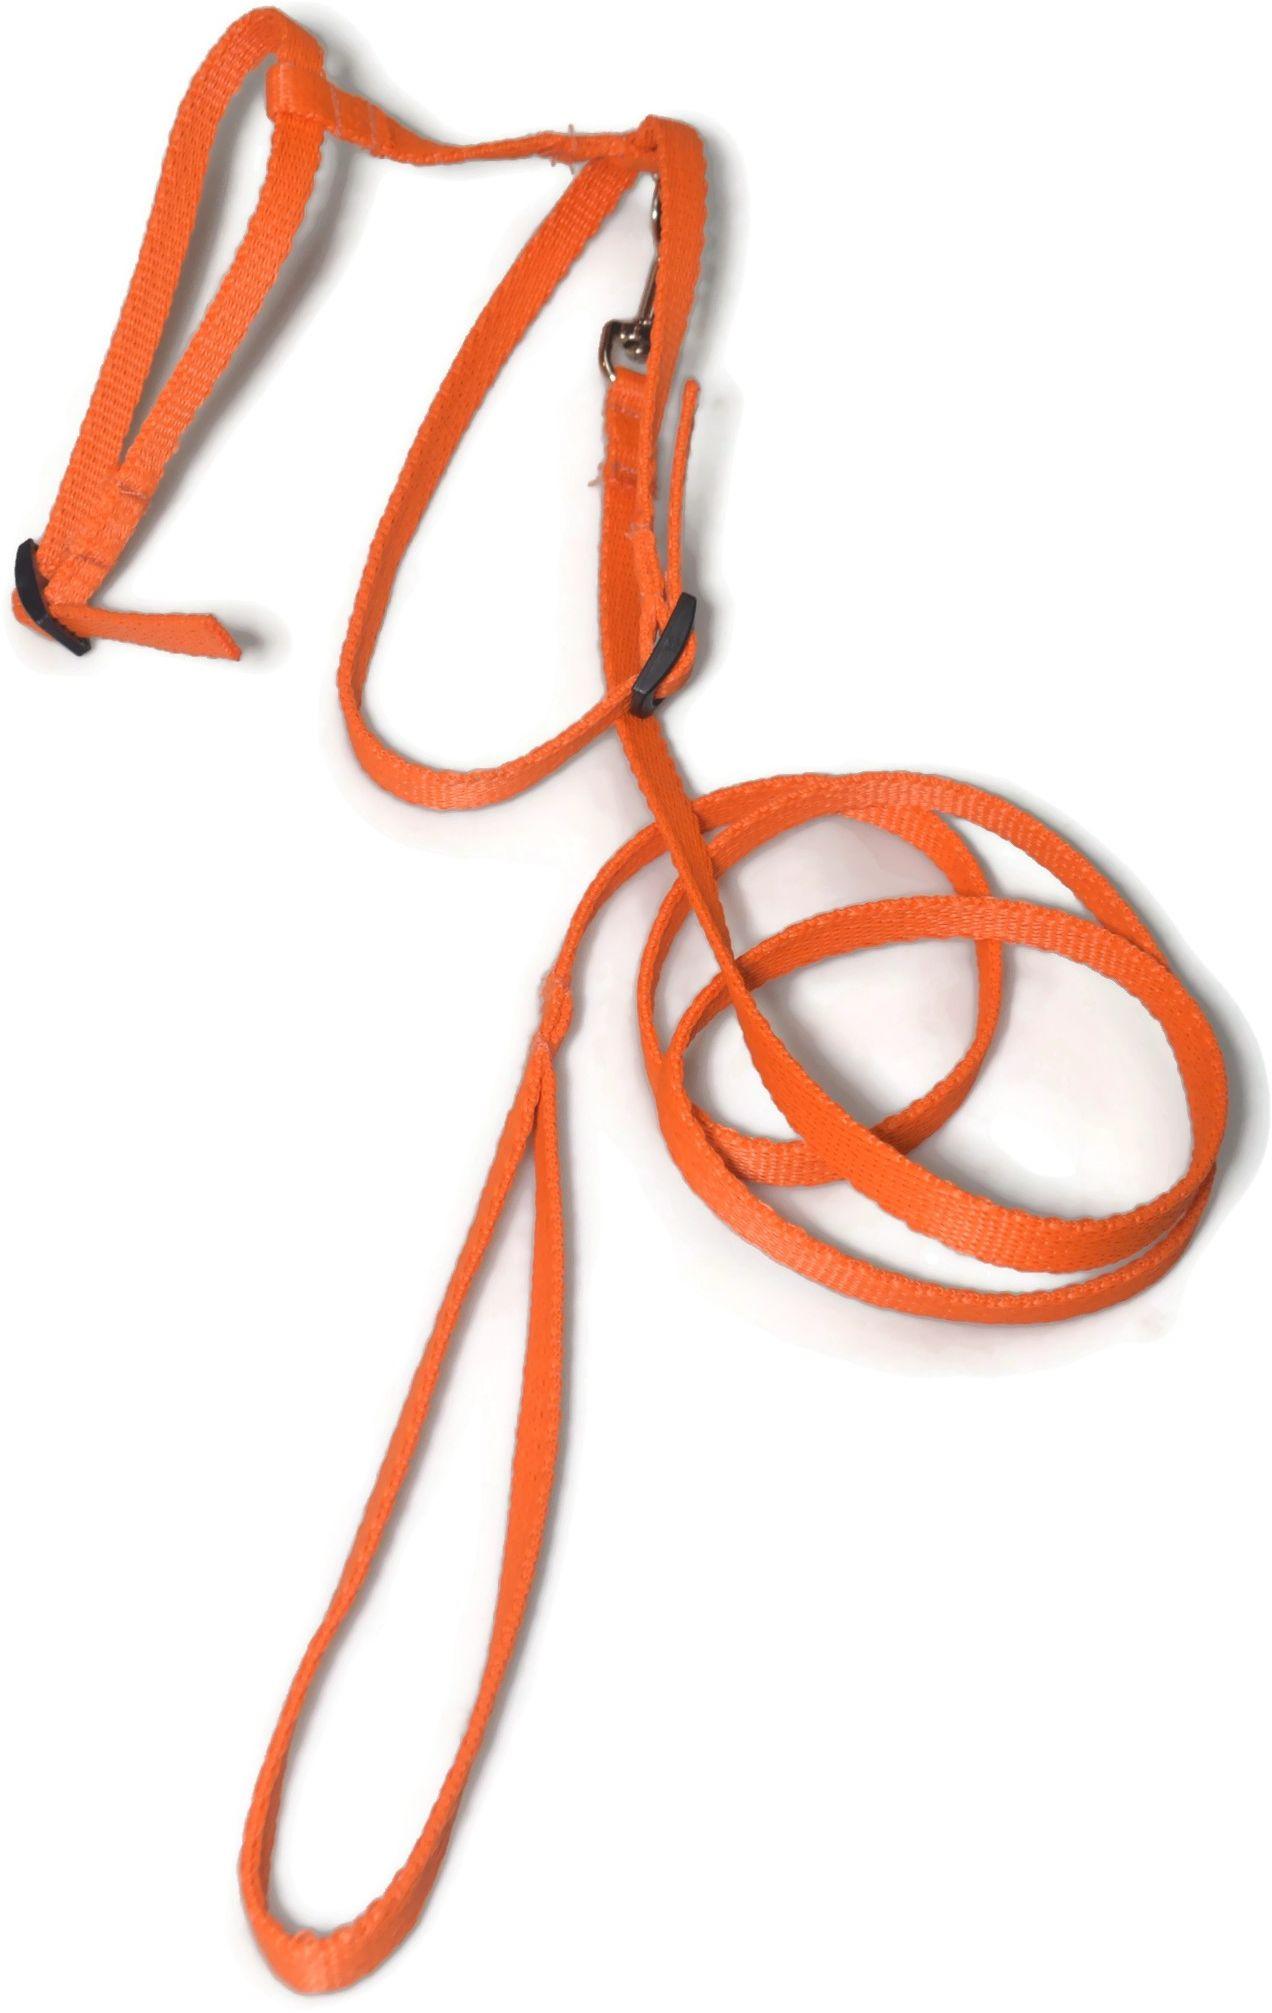 A-059 KOMPLET DLA KOTA V.2 : Kolor - Pomarańczowy - ALIZOO